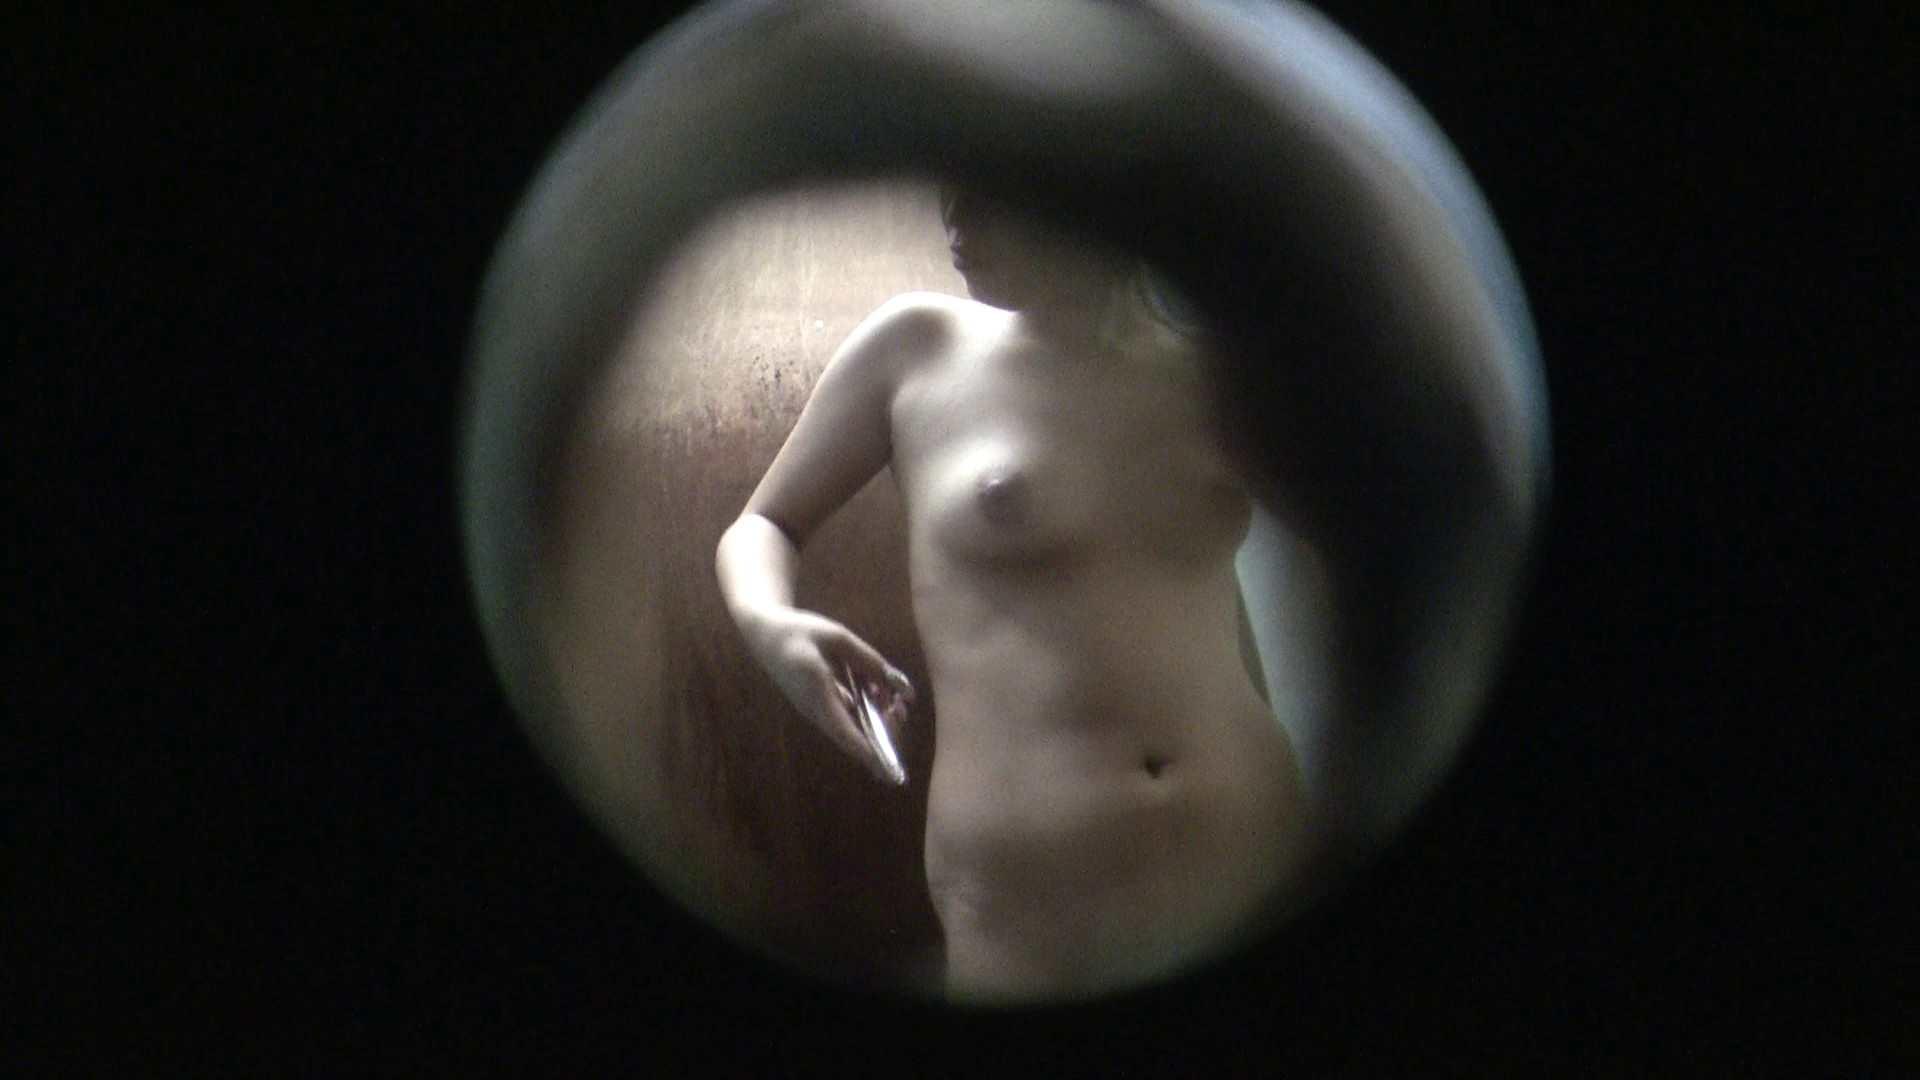 NO.03 ムッチリ色白ボディーに少し大きな乳輪 シャワー室   シャワー中  70連発 55